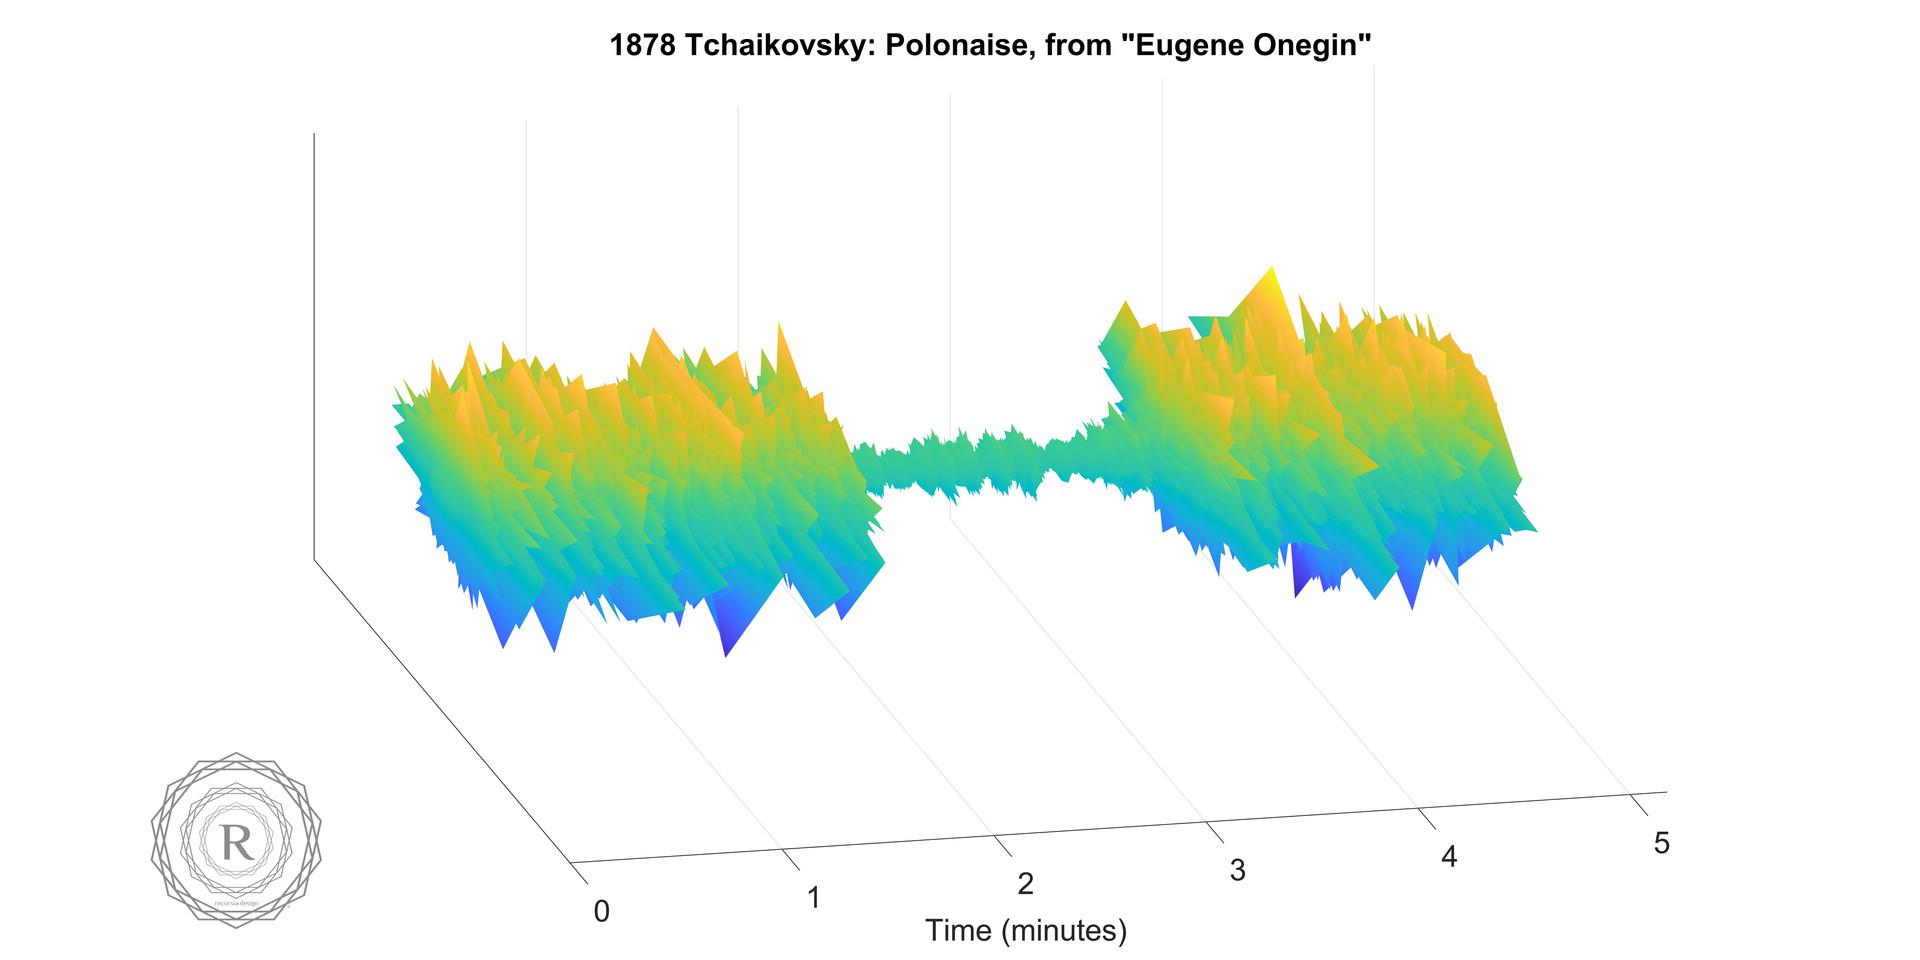 1878 Tchaikovsky- Polonaise, from Eugene